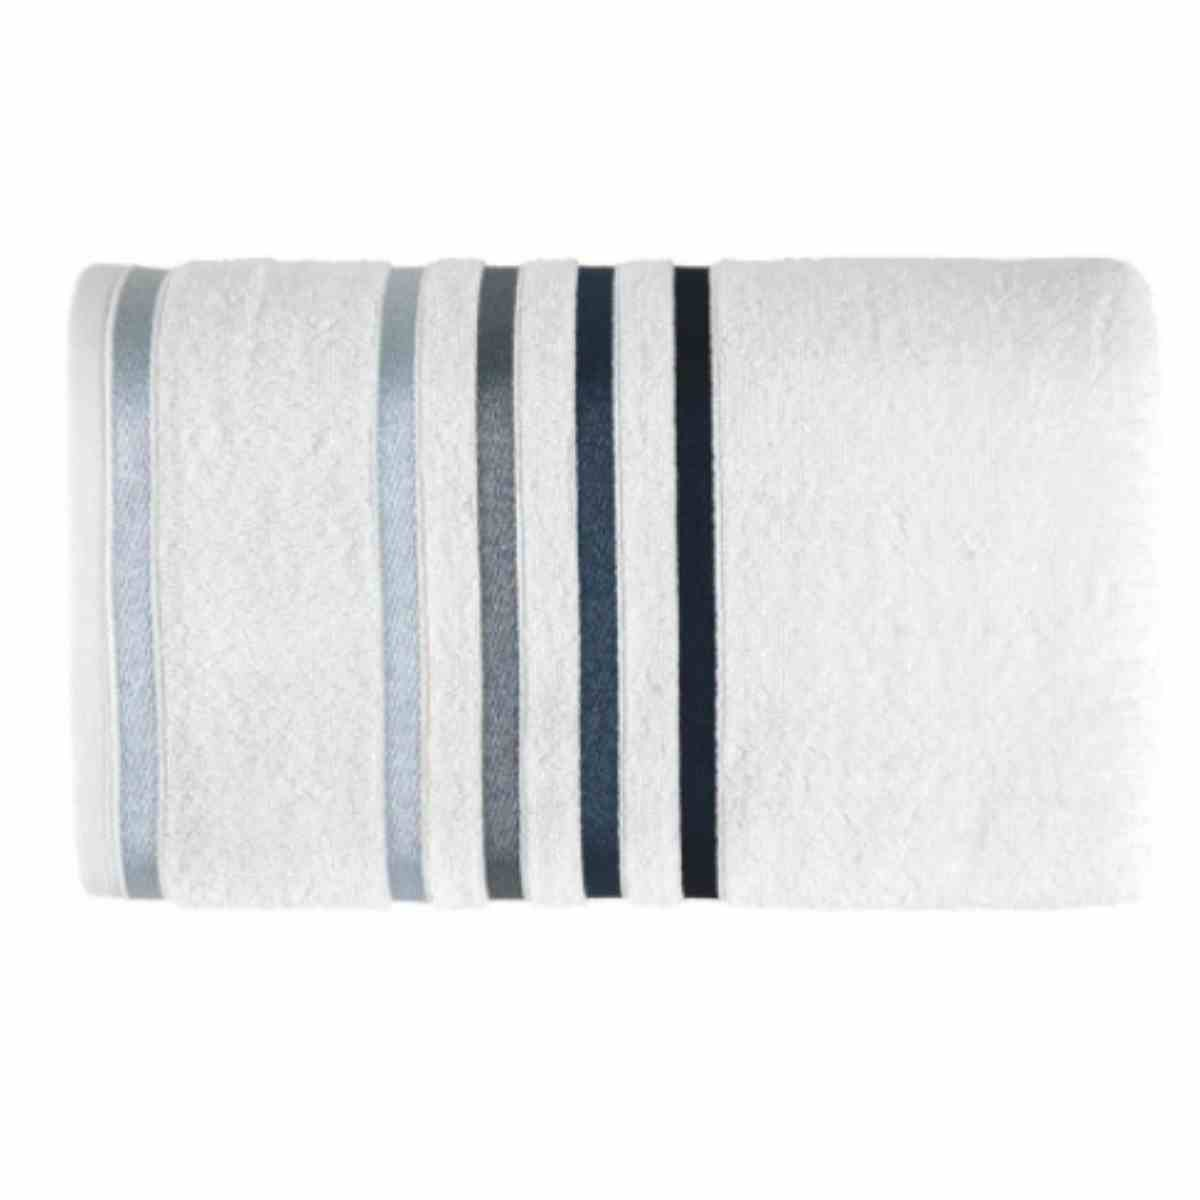 Toalha de Banho Lumina 70x140 Branco/Azul